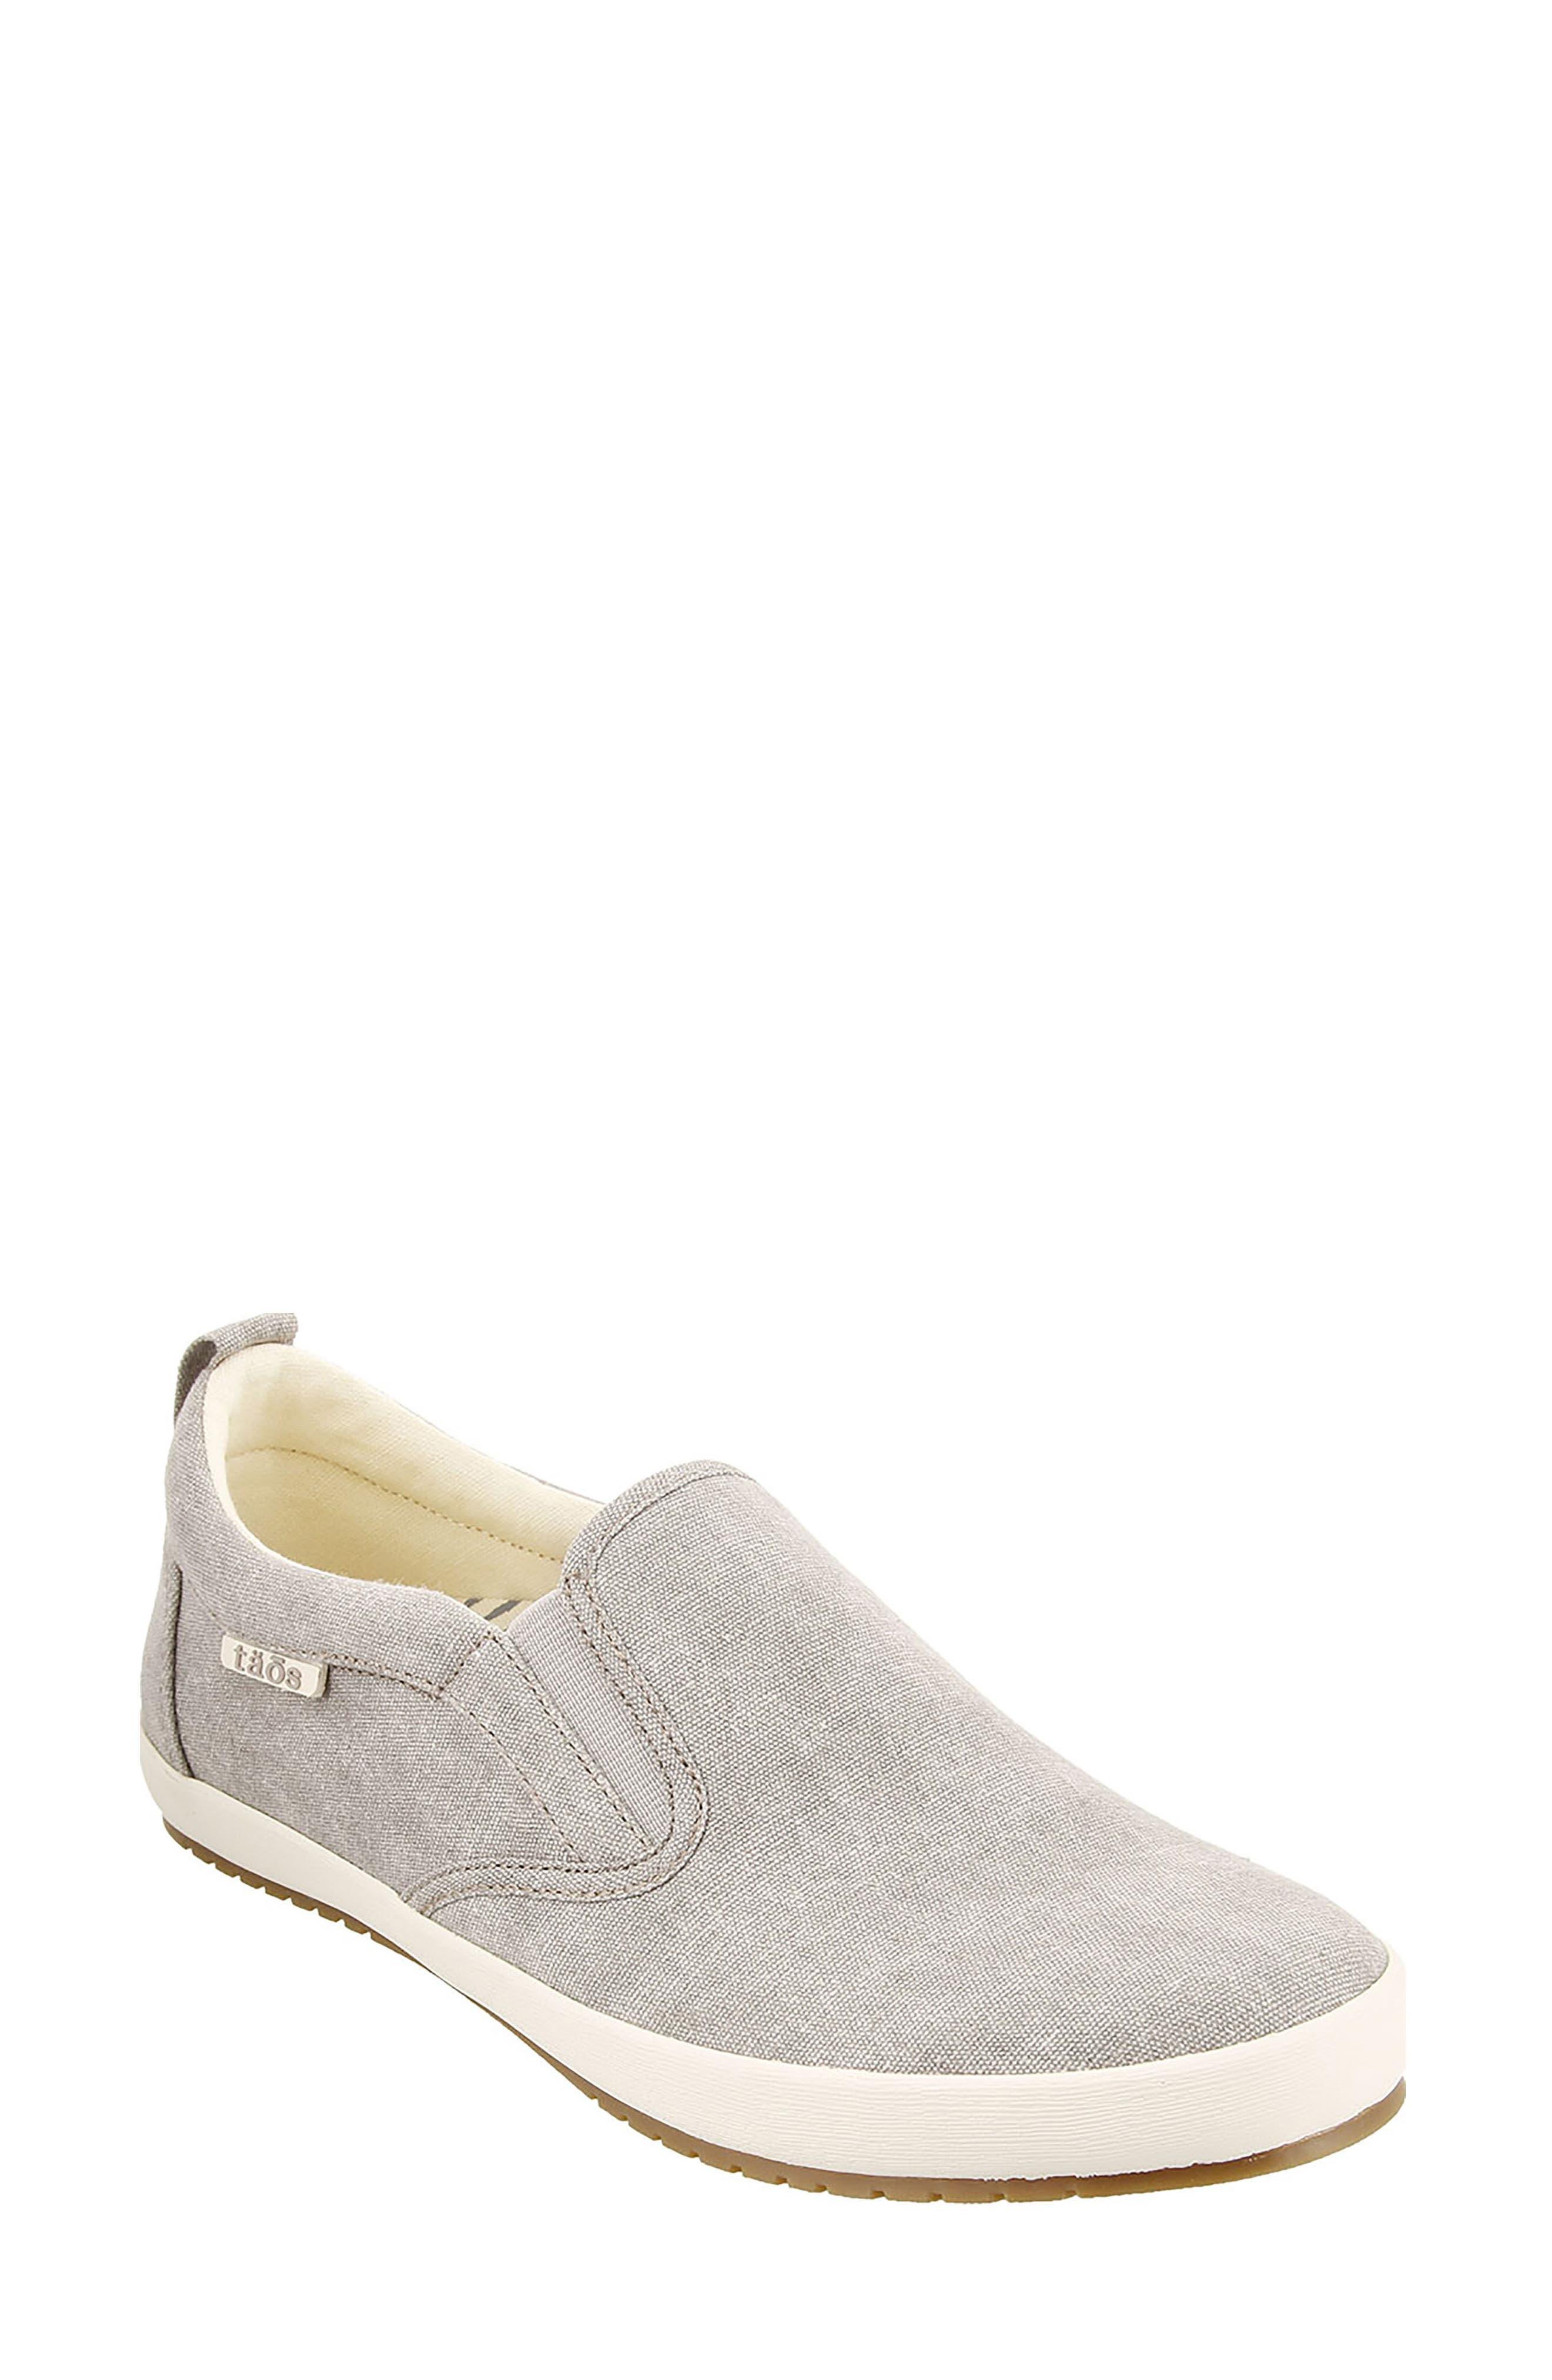 Alternate Image 1 Selected - Taos Dandy Slip-On Sneaker (Women)